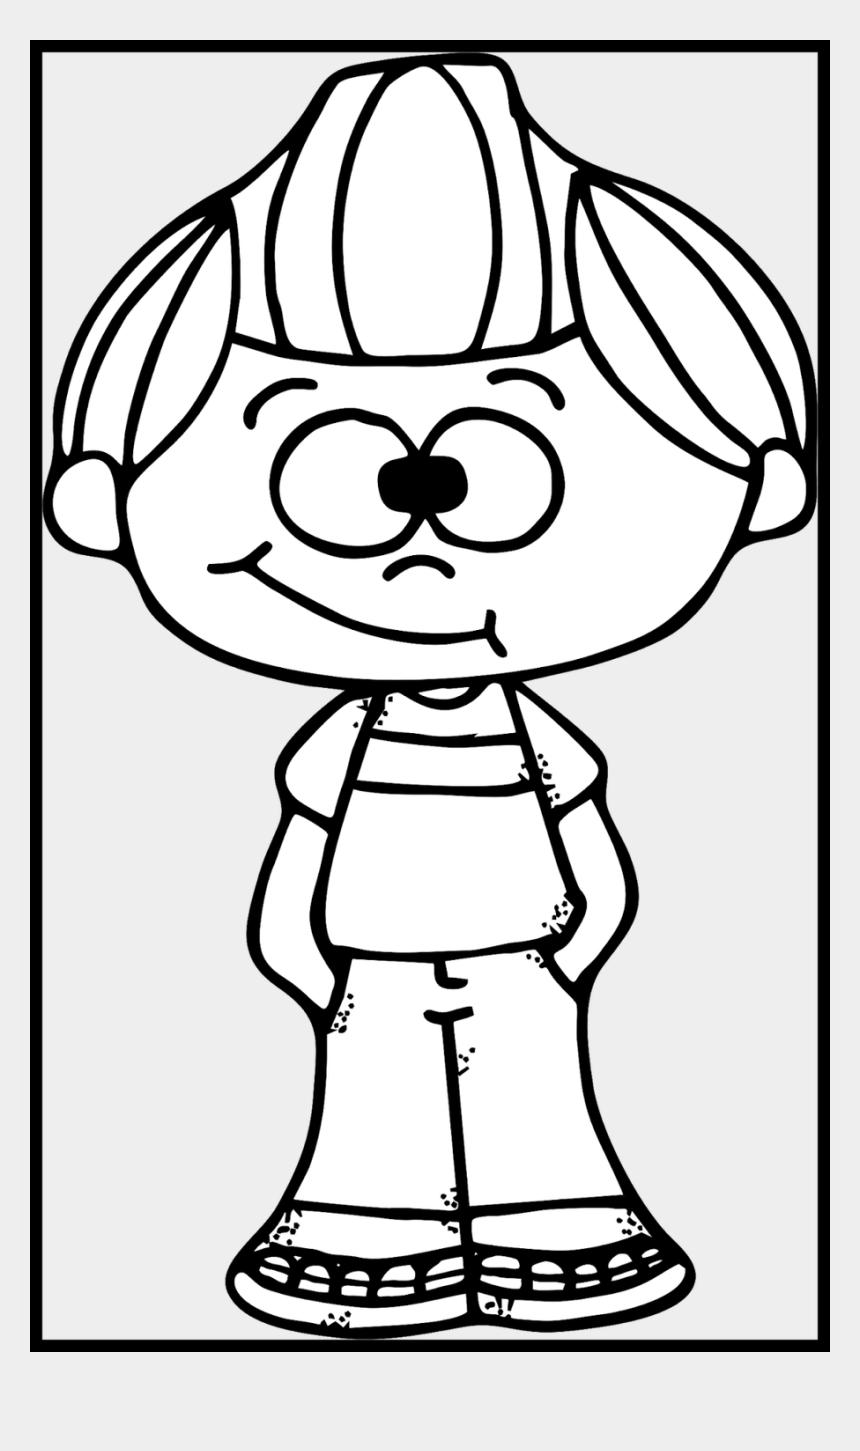 stars clipart black and white, Cartoons - Astonishing Worksheetjunkie Cute Boy Clipart Bie Marcos - Cute Boy Clipart